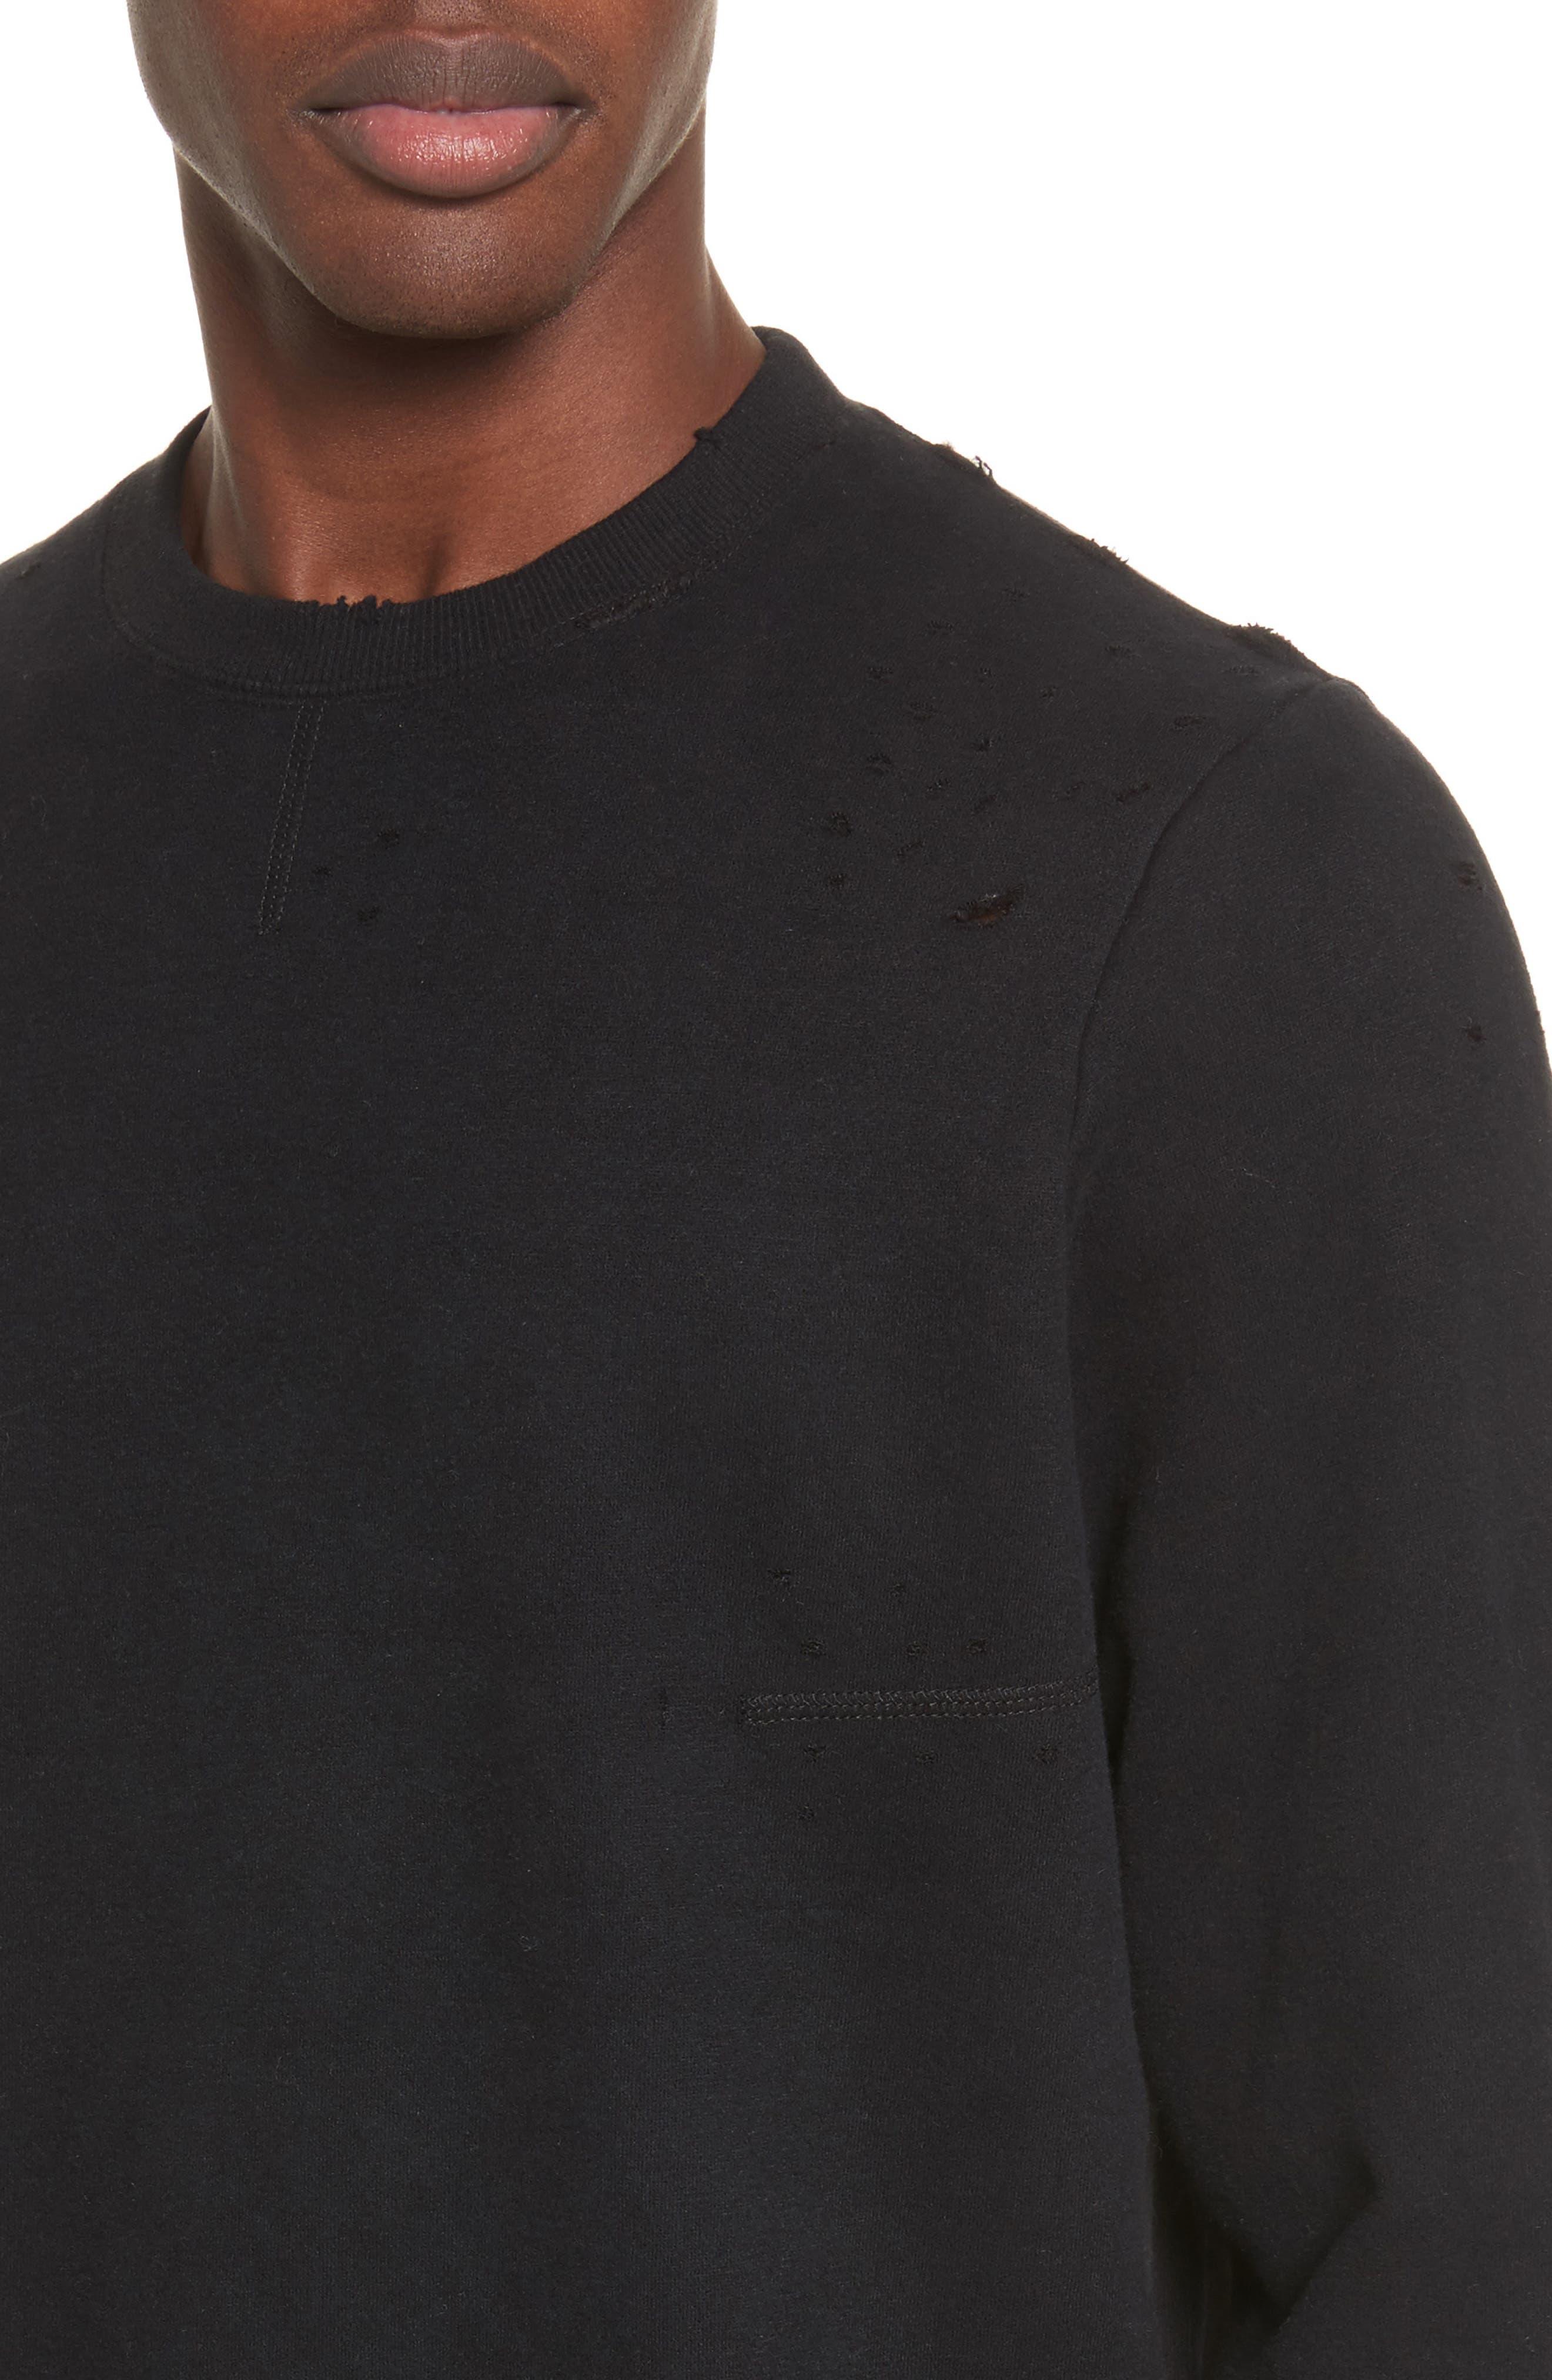 Distressed Crewneck Sweatshirt,                             Alternate thumbnail 4, color,